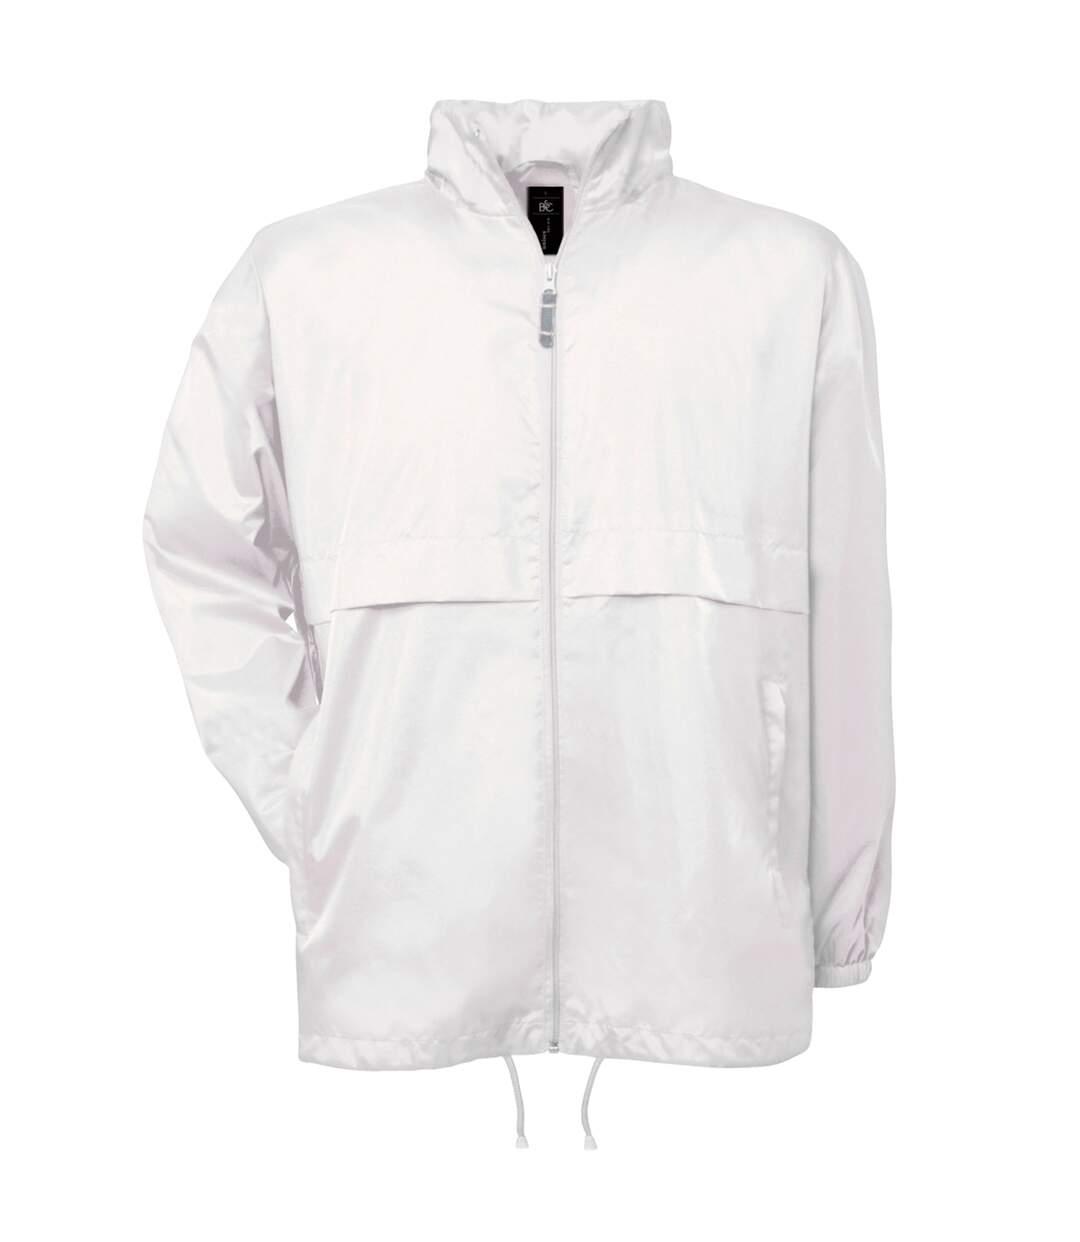 B&C Mens Air Lightweight Windproof, Showerproof & Water Repellent Jacket (White) - UTBC1281